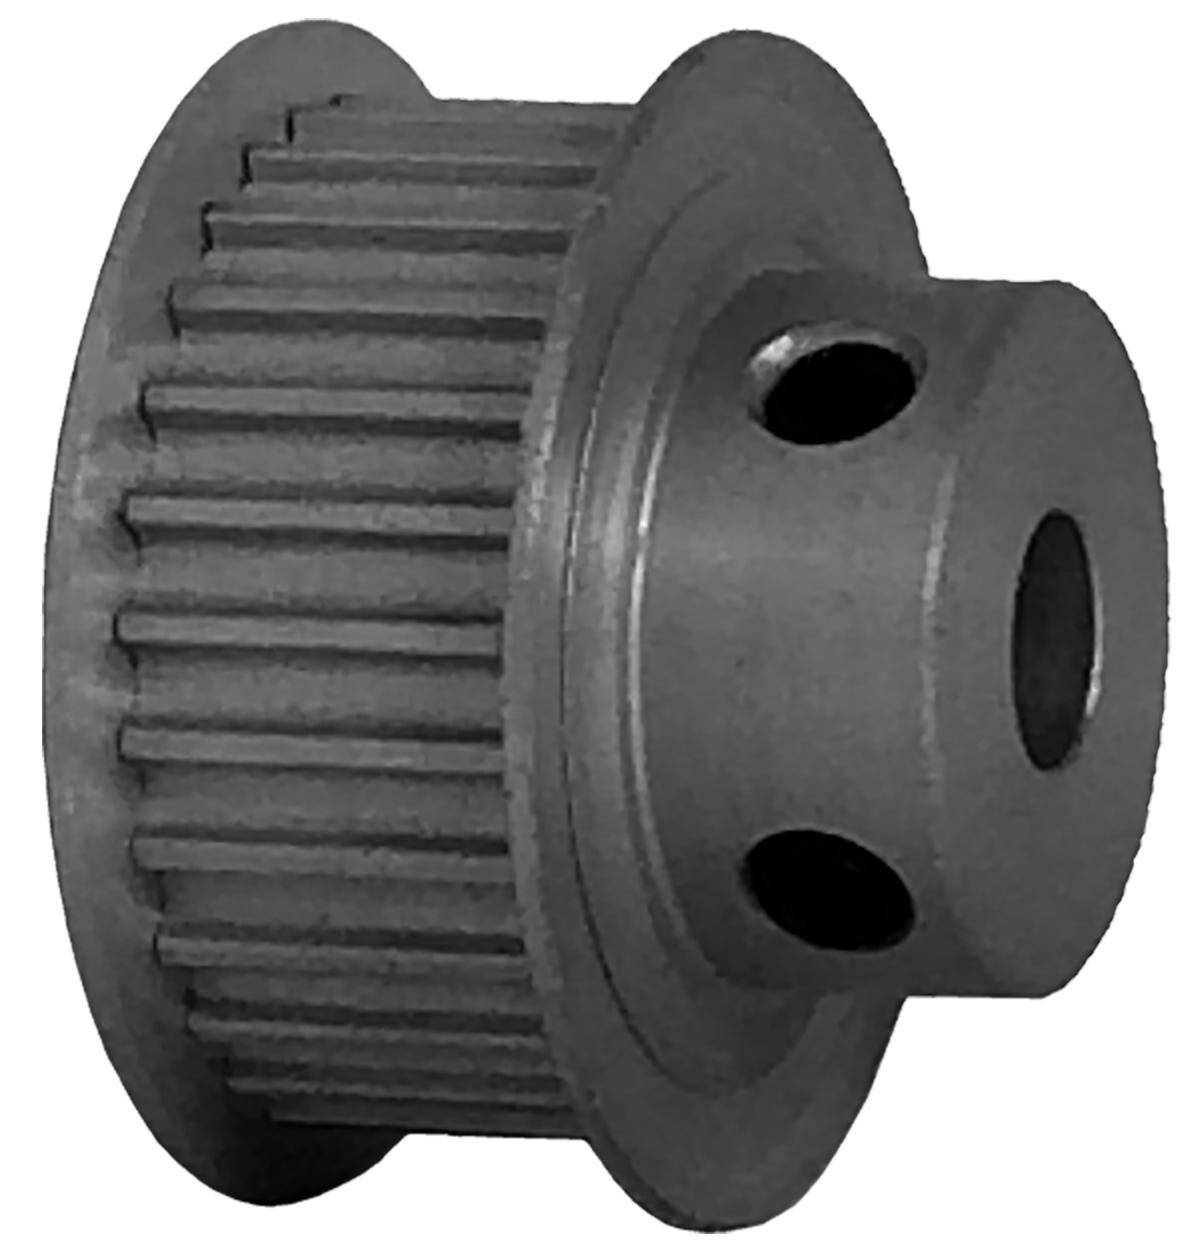 28-3M09-6FA3 - Aluminum Powerhouse®HTD® Pulleys